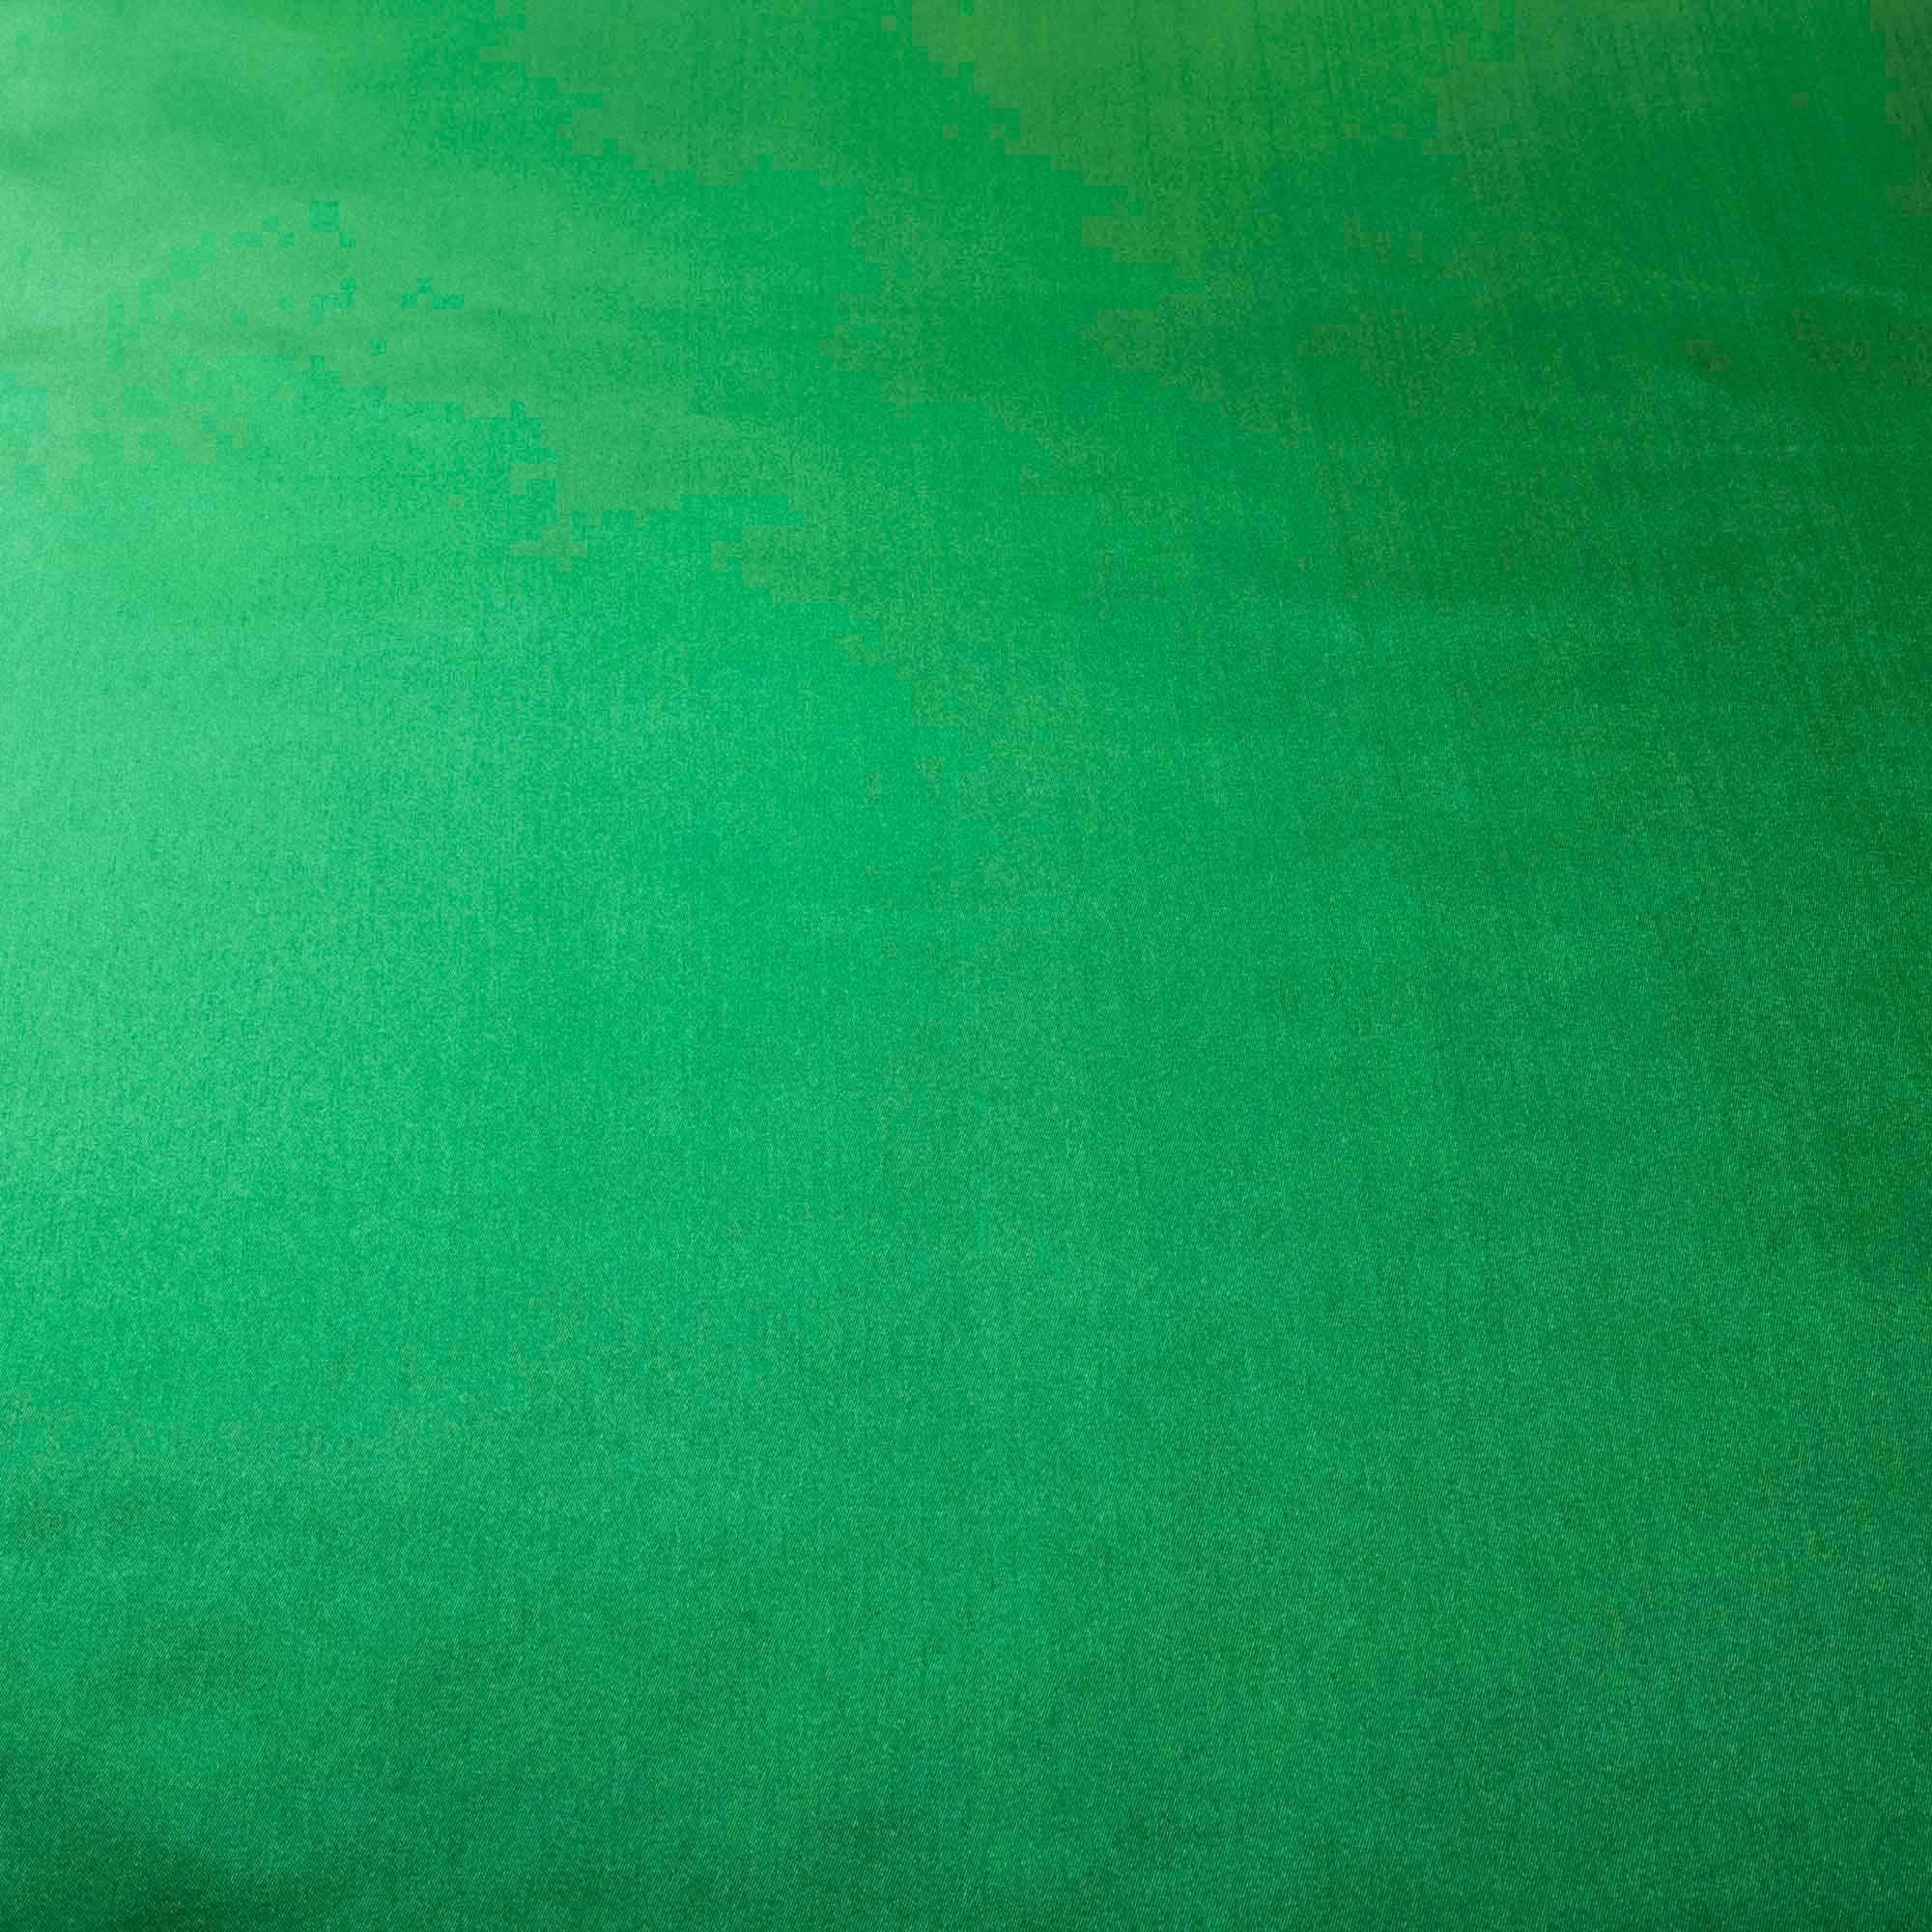 Tecido Cetim Charmeuse Verde Bandeira 100% Poliester 1,50 Mt Largura